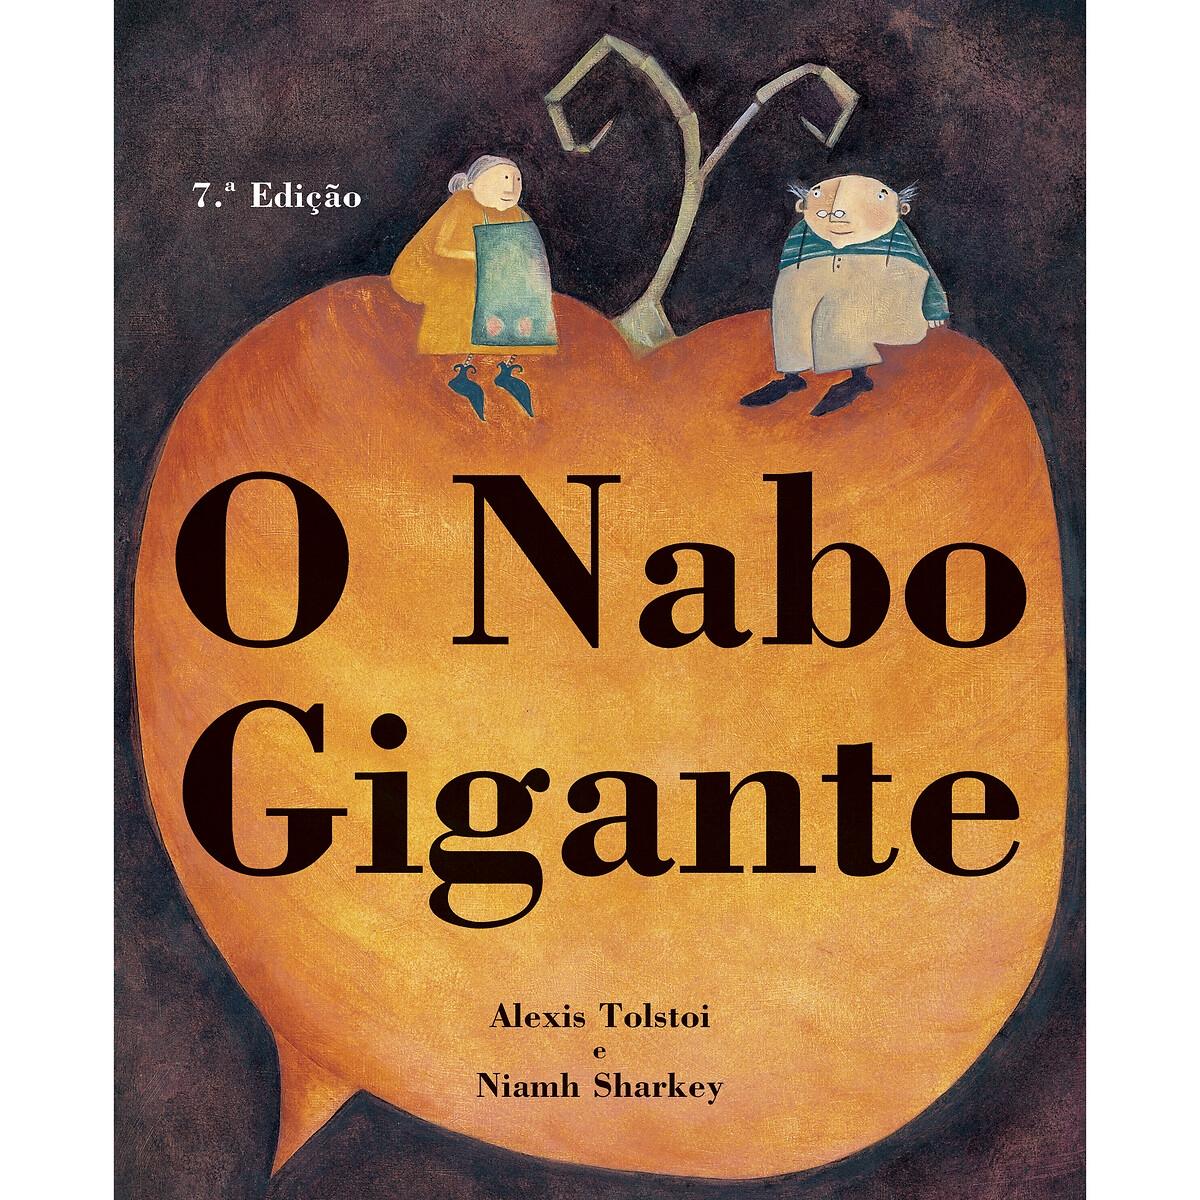 LIVROS HORIZONTE - Livros Horizonte Livro O Nabo Gigante